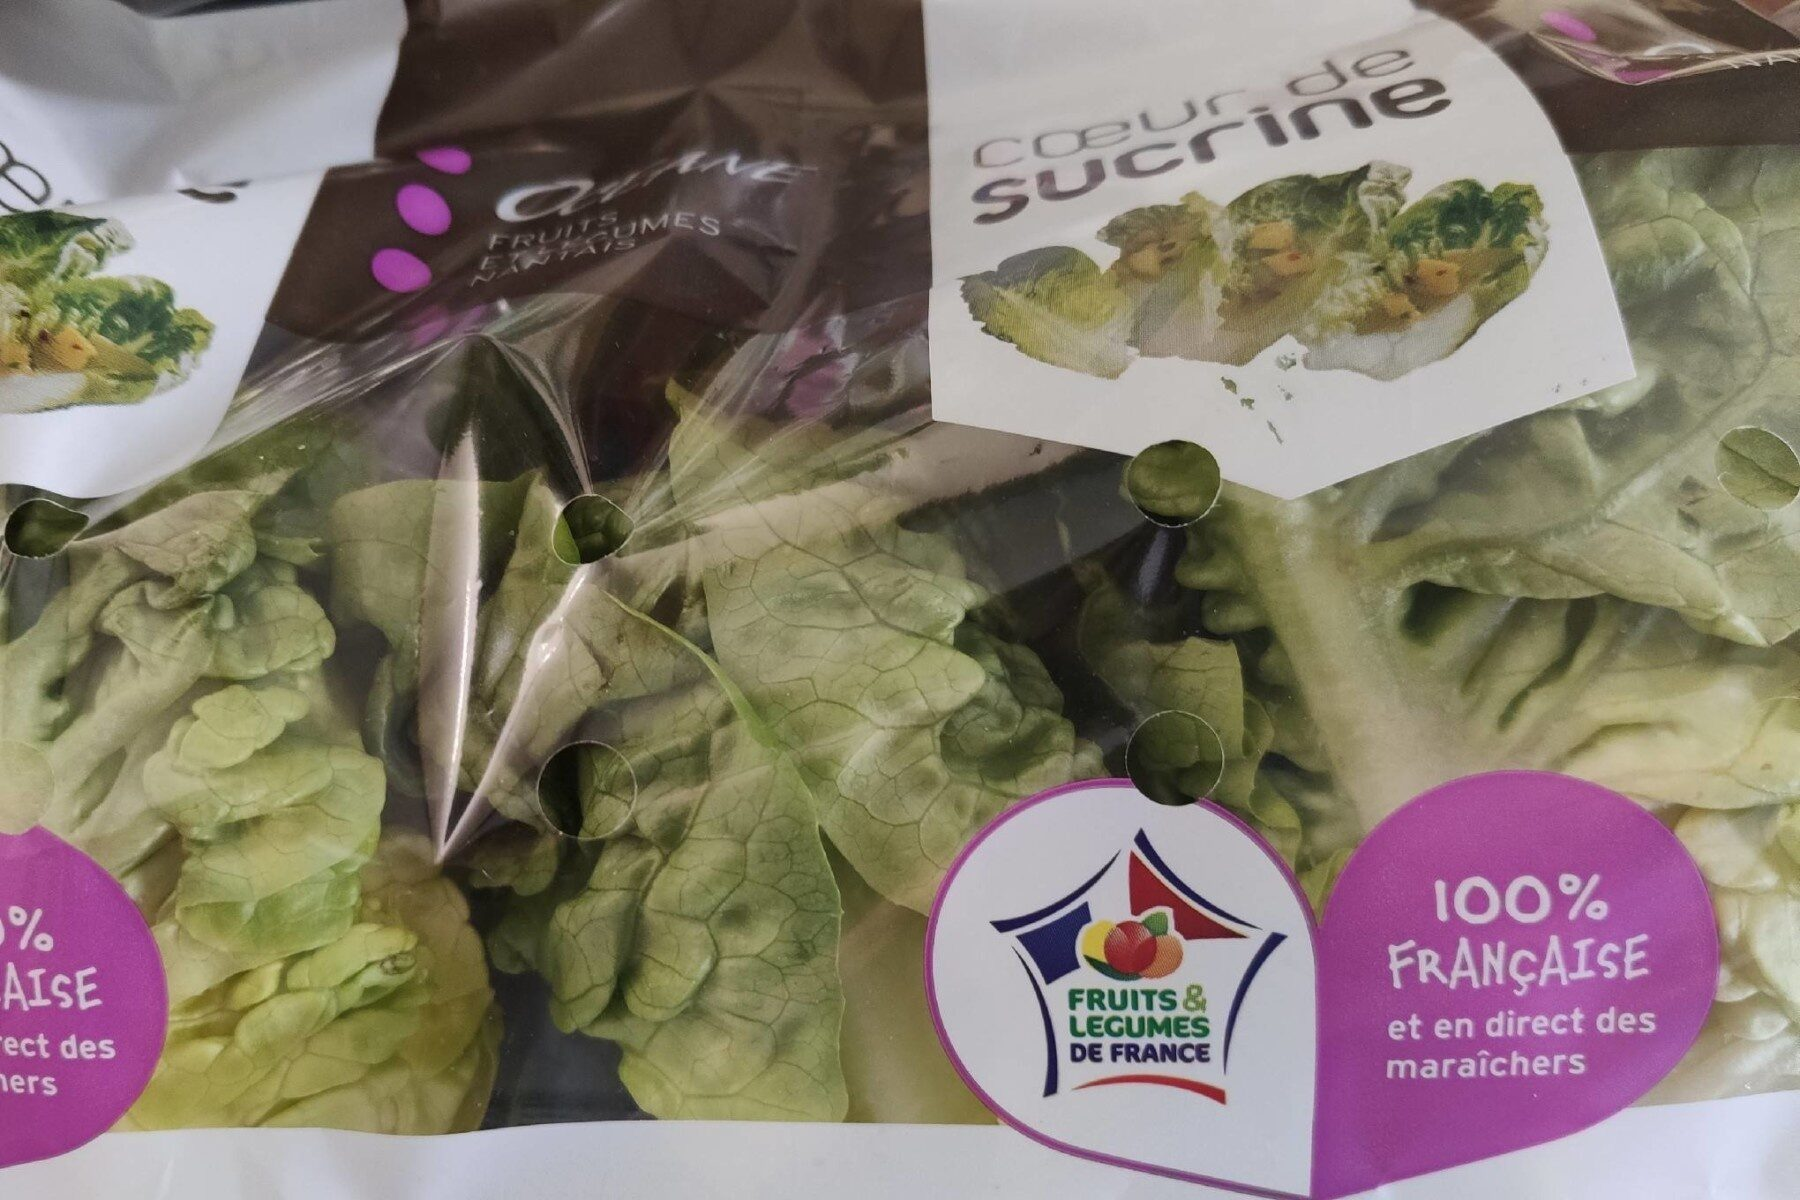 Salade, Variété Sucrine, Catégorie 1 - Product - fr